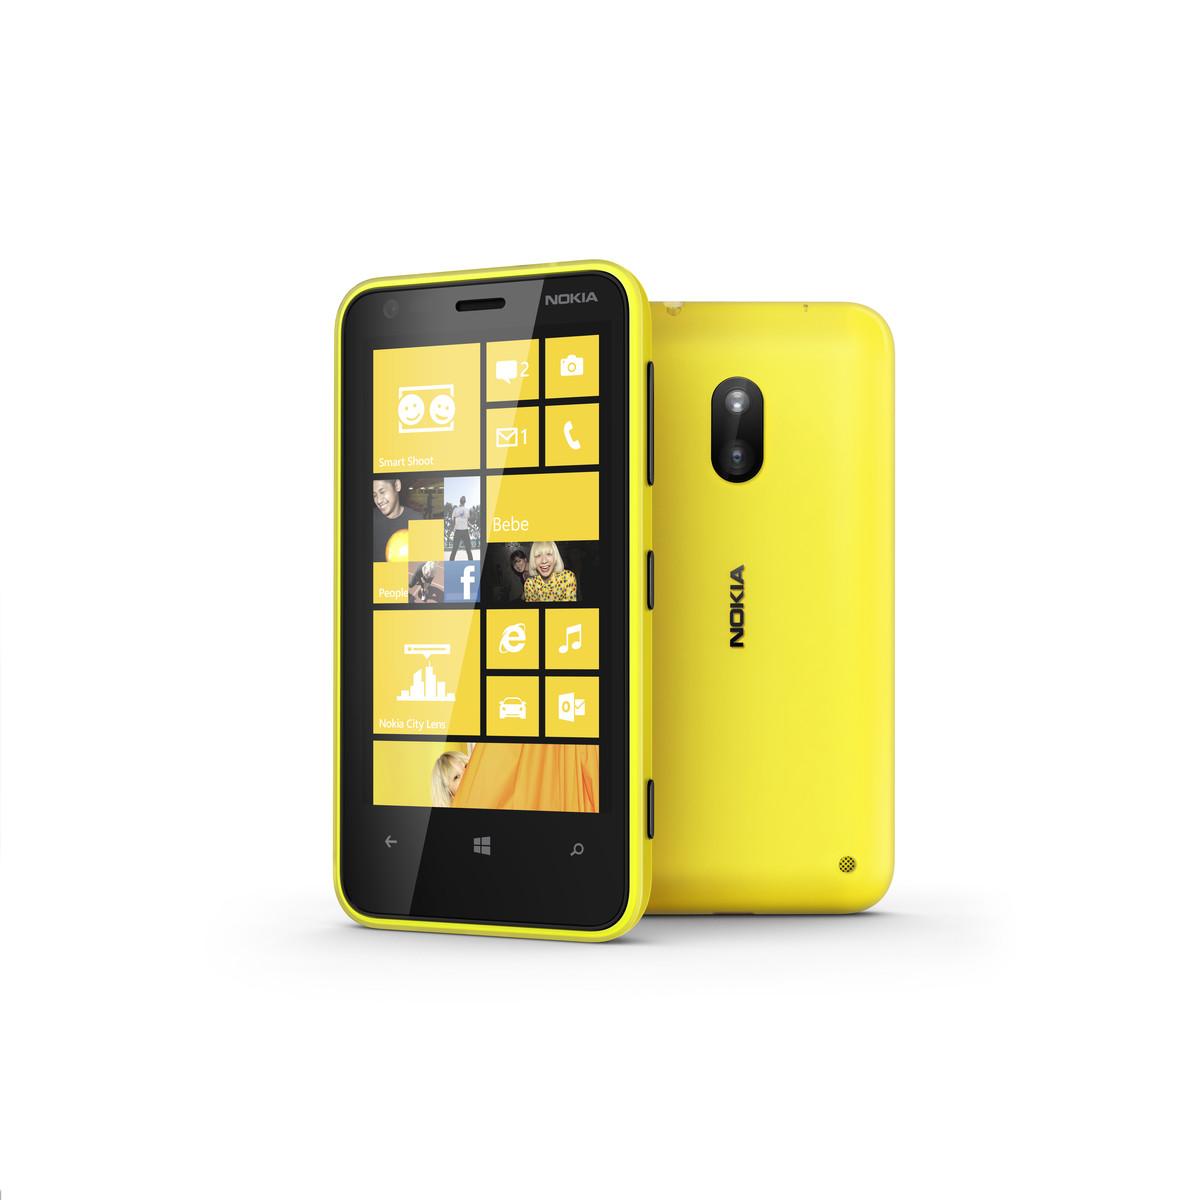 Test Nokia Lumia 620 Smartphone - Notebookcheck.com Tests